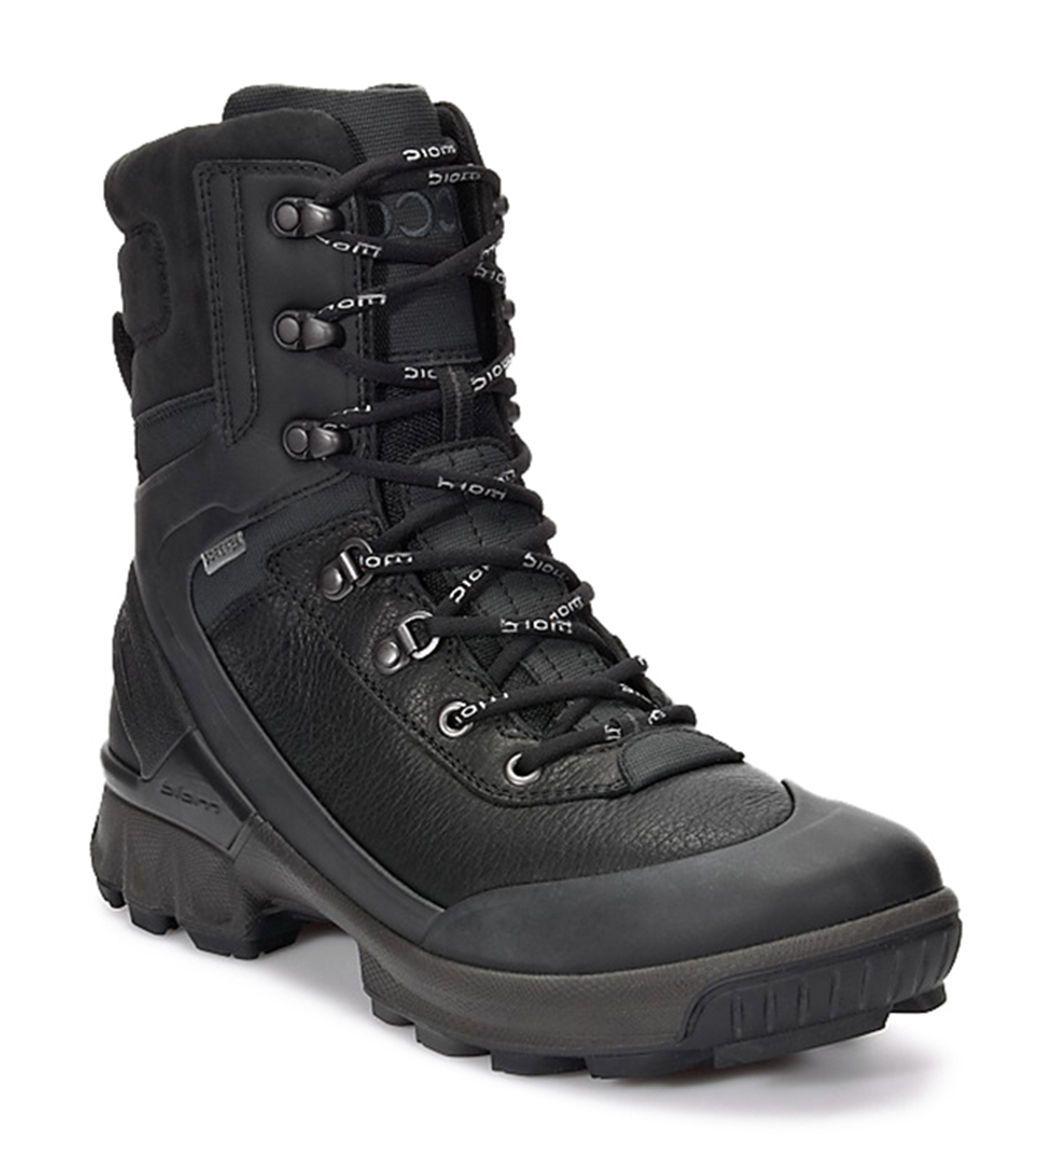 ecco boots sale online